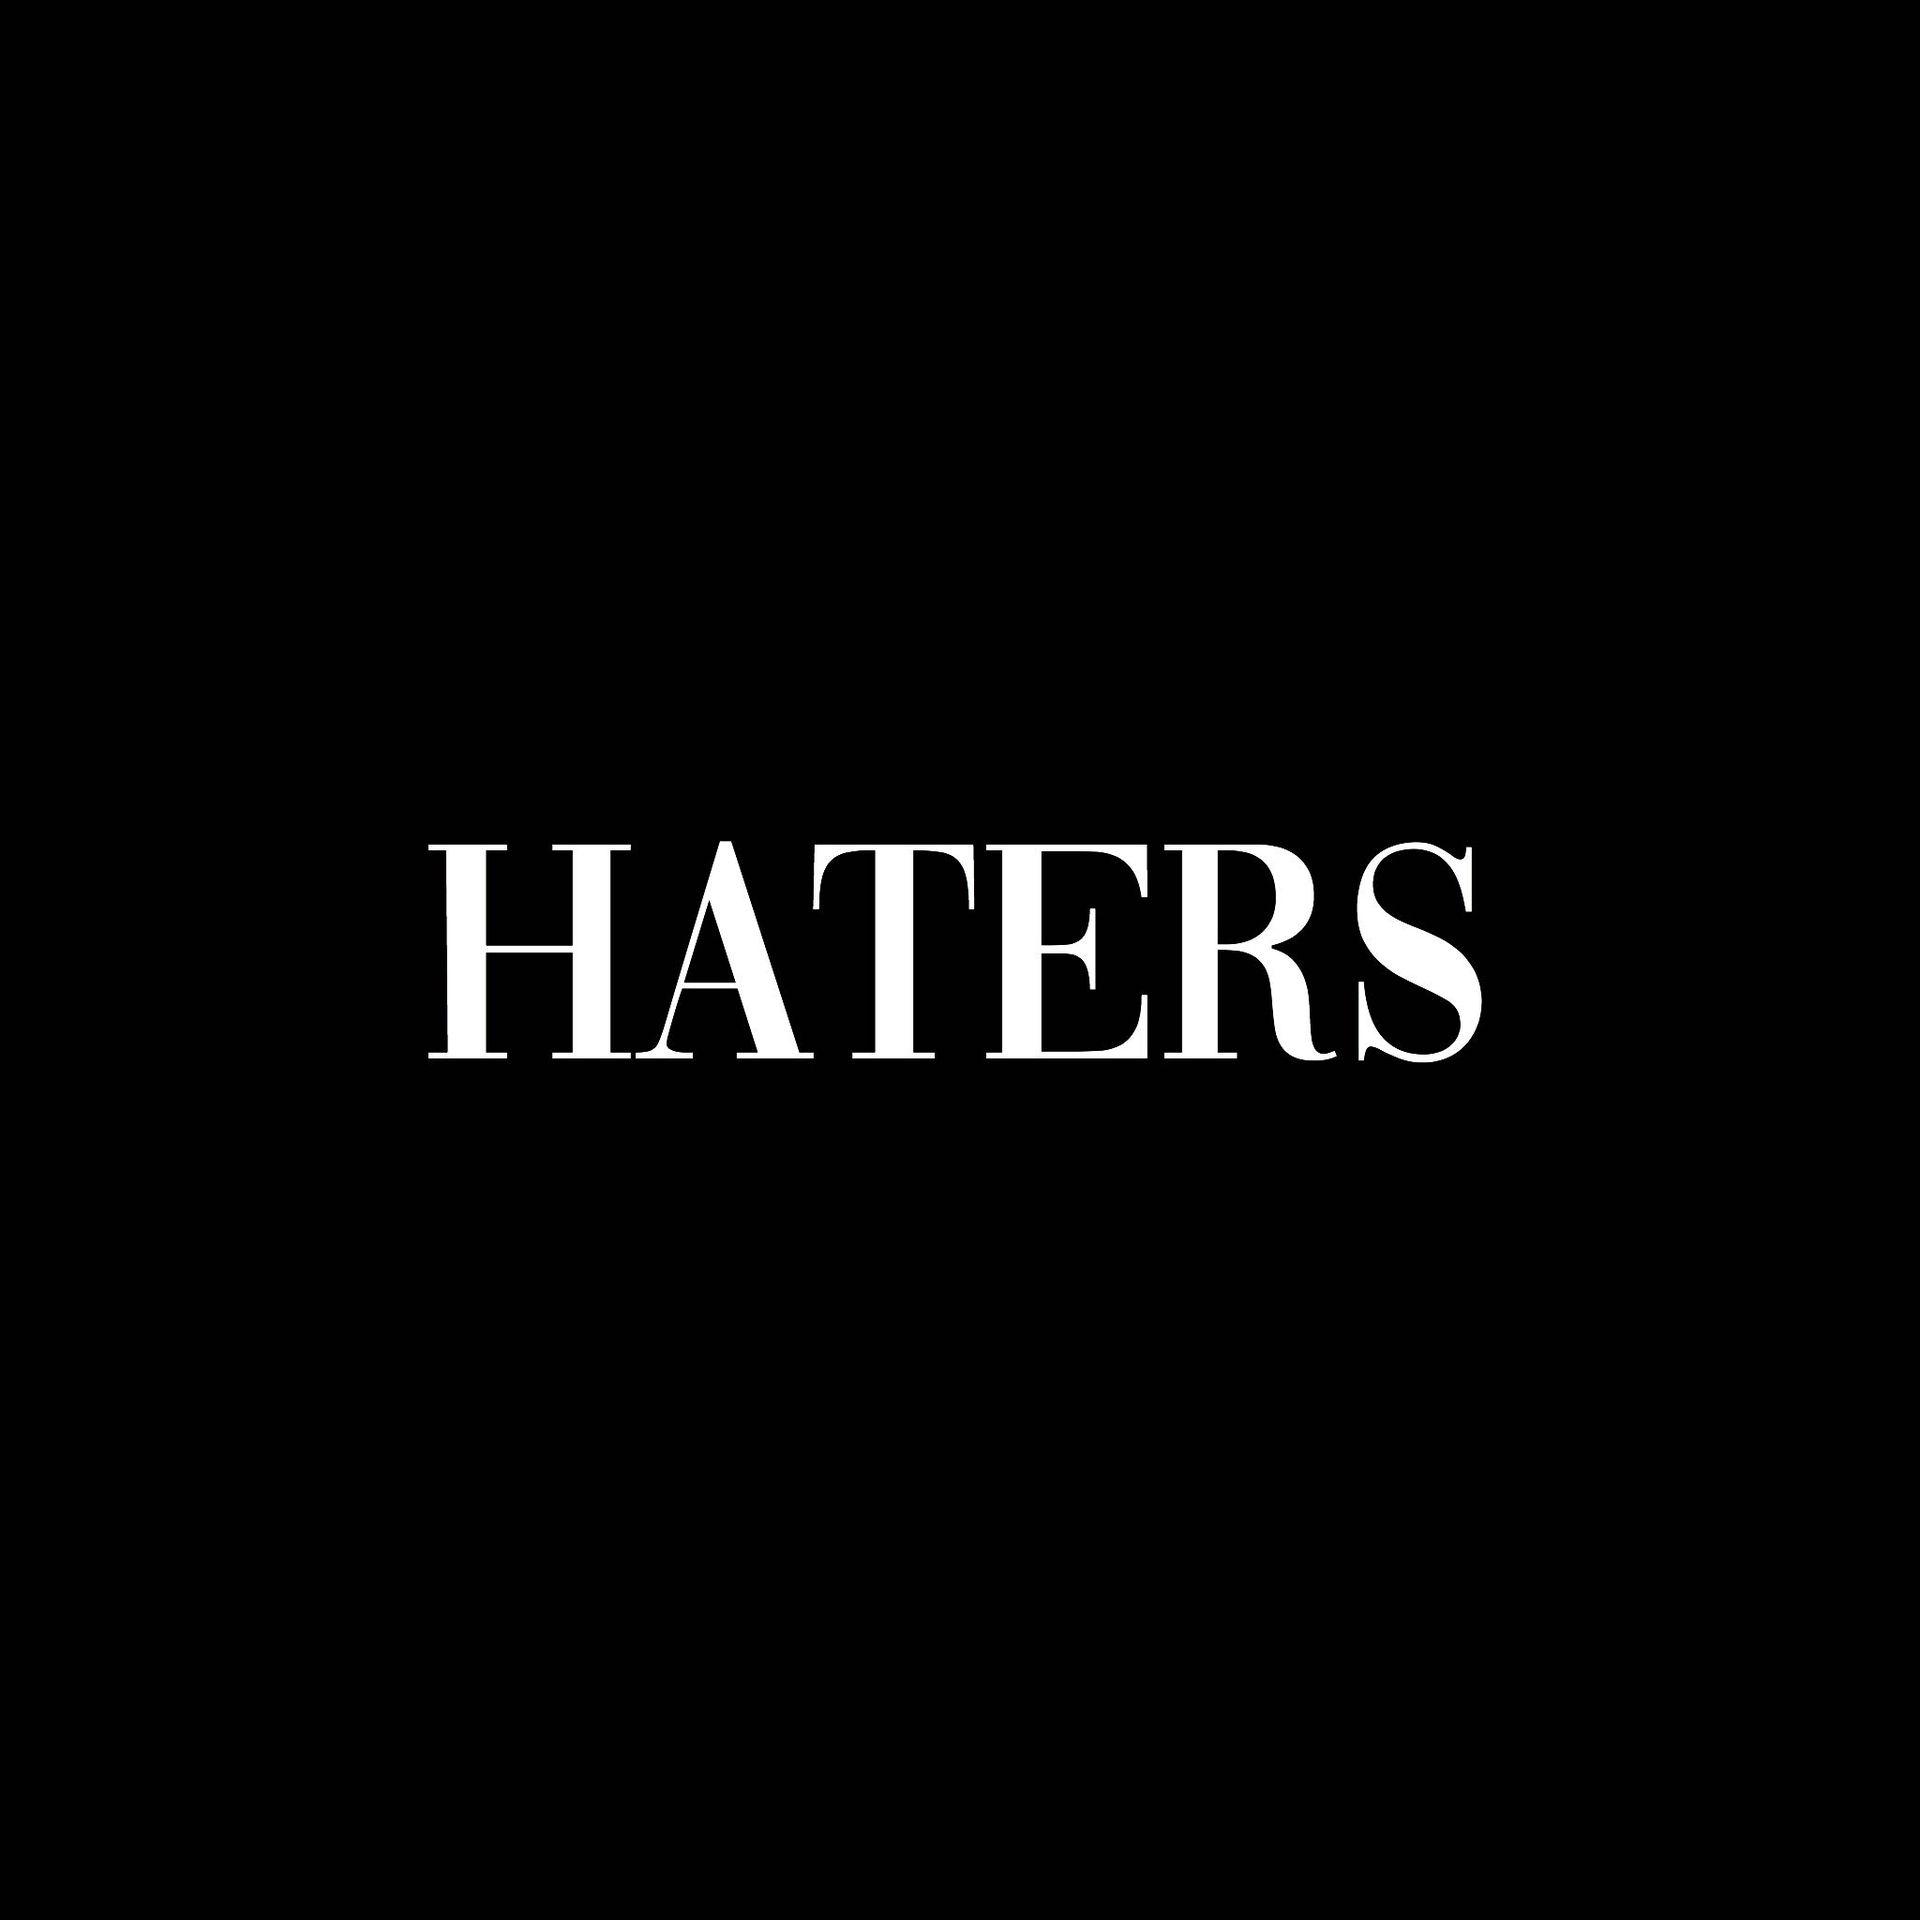 My Horror Story Writing Experience - Haters - Wattpad